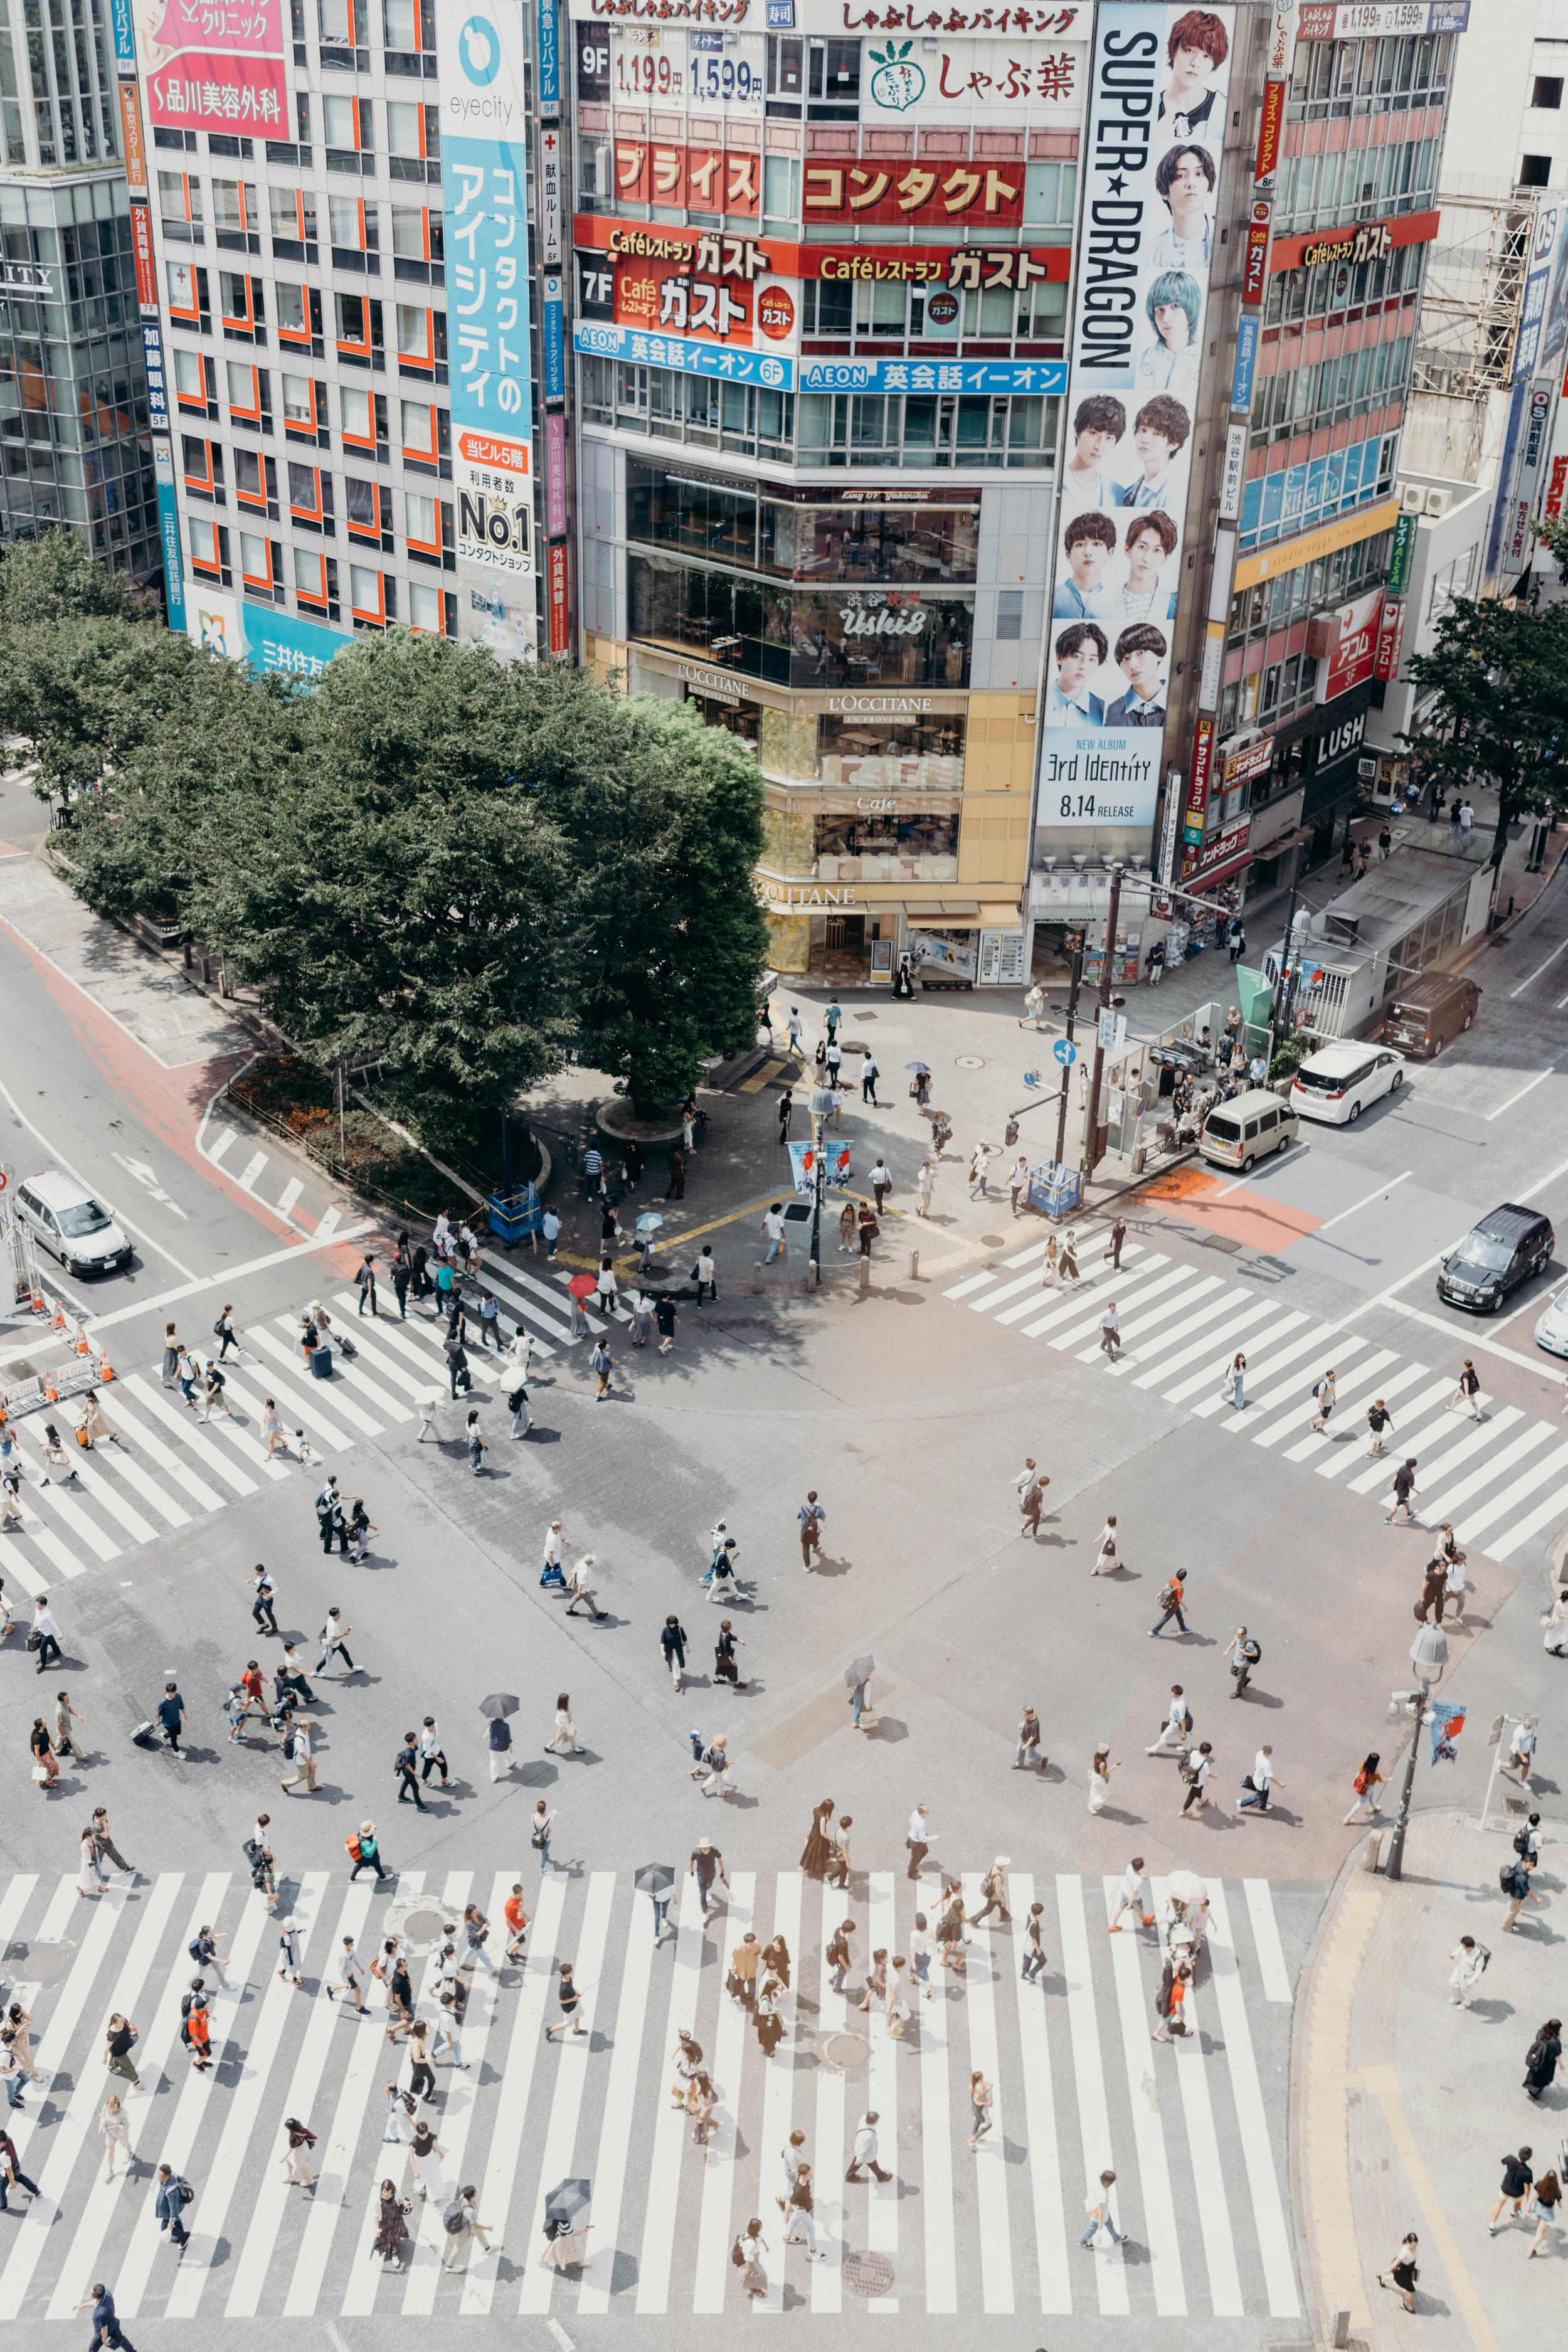 A Three-Day Girls' Trip to Tokyo | On the Street Where We Live ( aretherelilactrees.com )  Shibuya Crossing, Magnet by Shibuya109, Shibuya, Tokyo, Japan